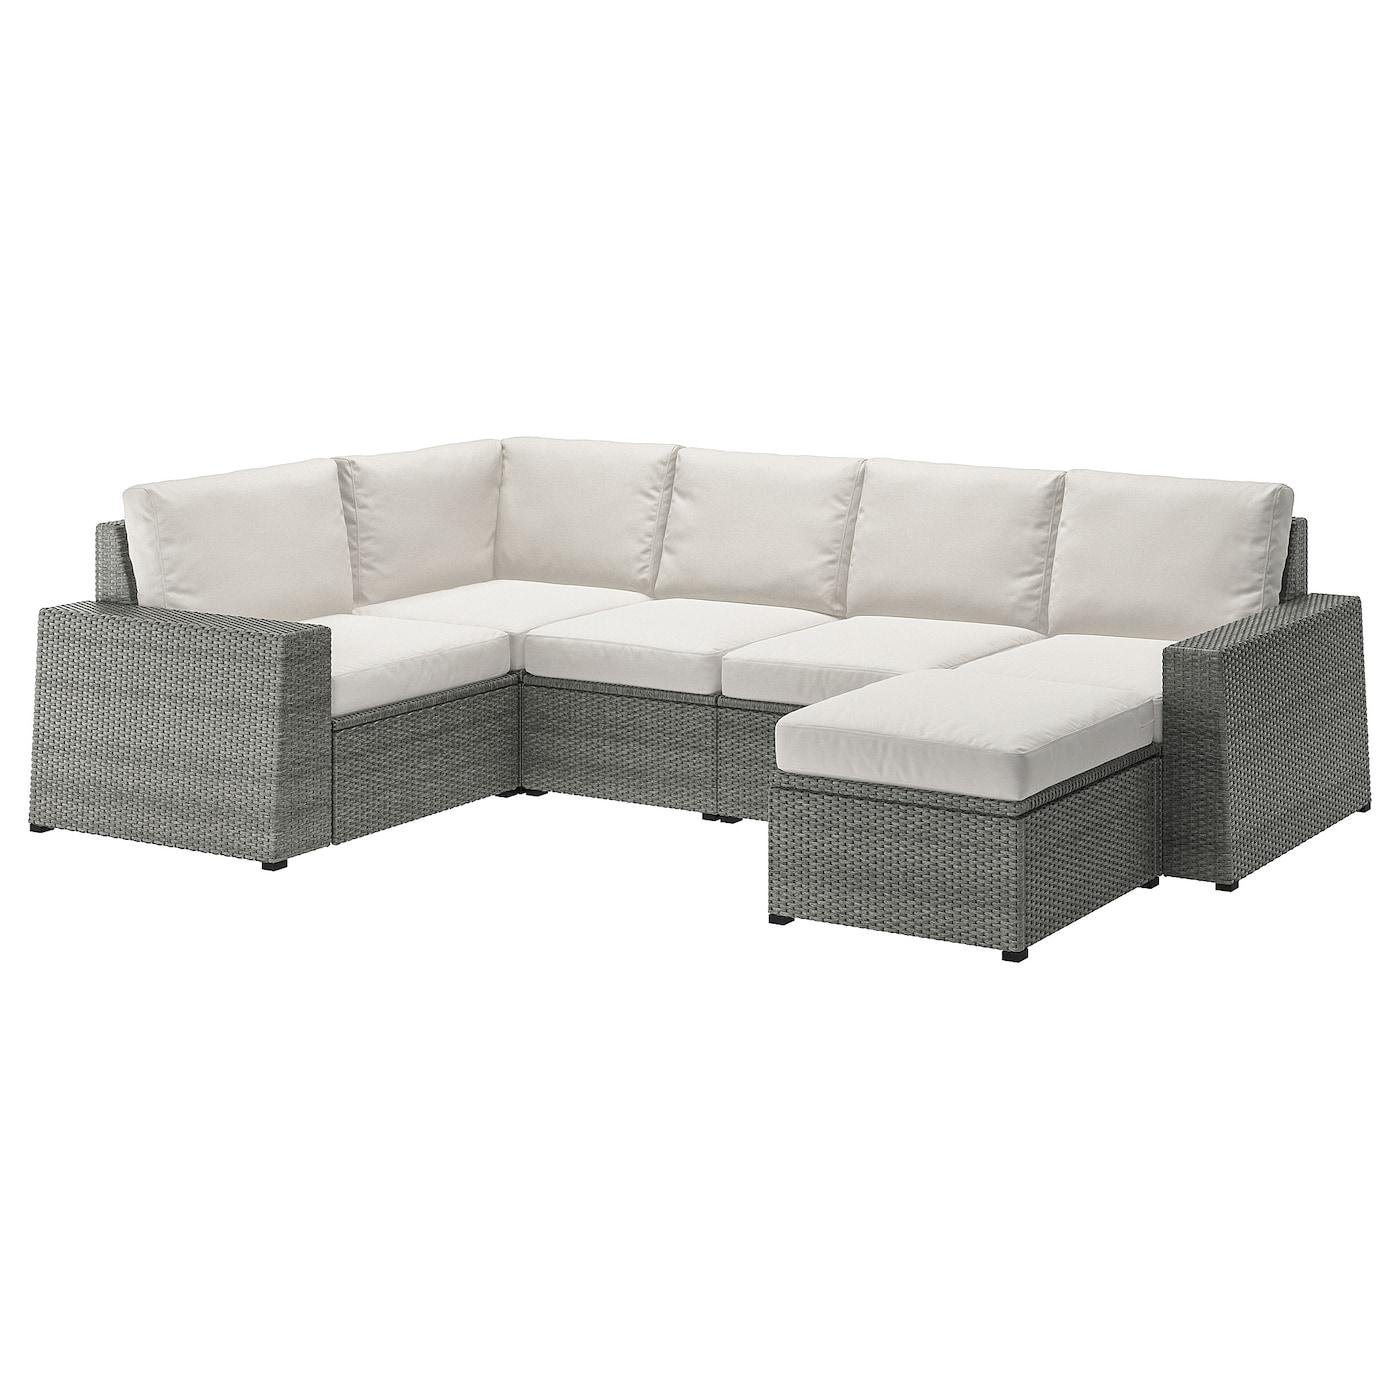 SOLLERÖN Modular corner sofa 4-seat, outdoor, with footstool dark gray,  Hållö beige